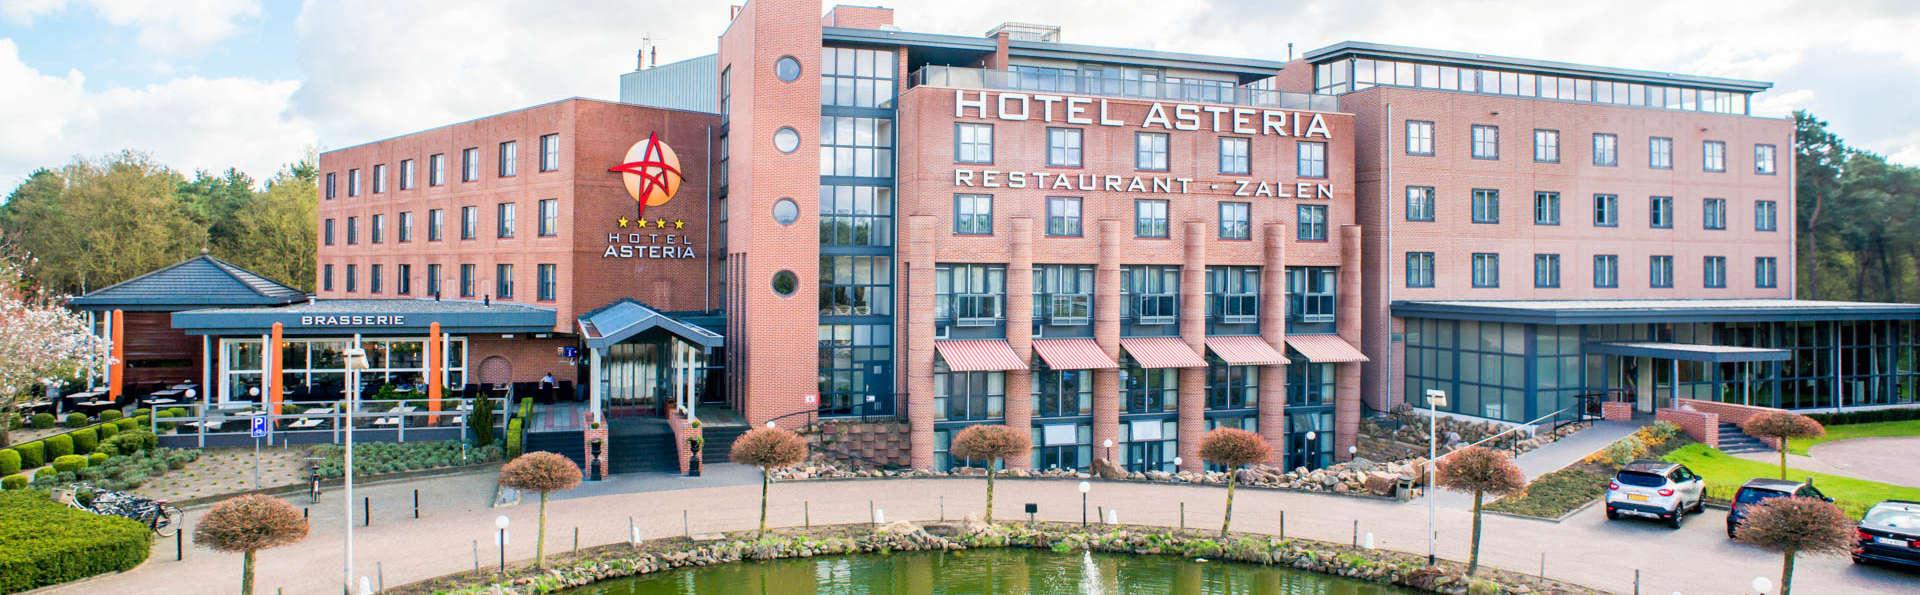 Hotel Asteria - EDIT_NEW_FRONT.jpg